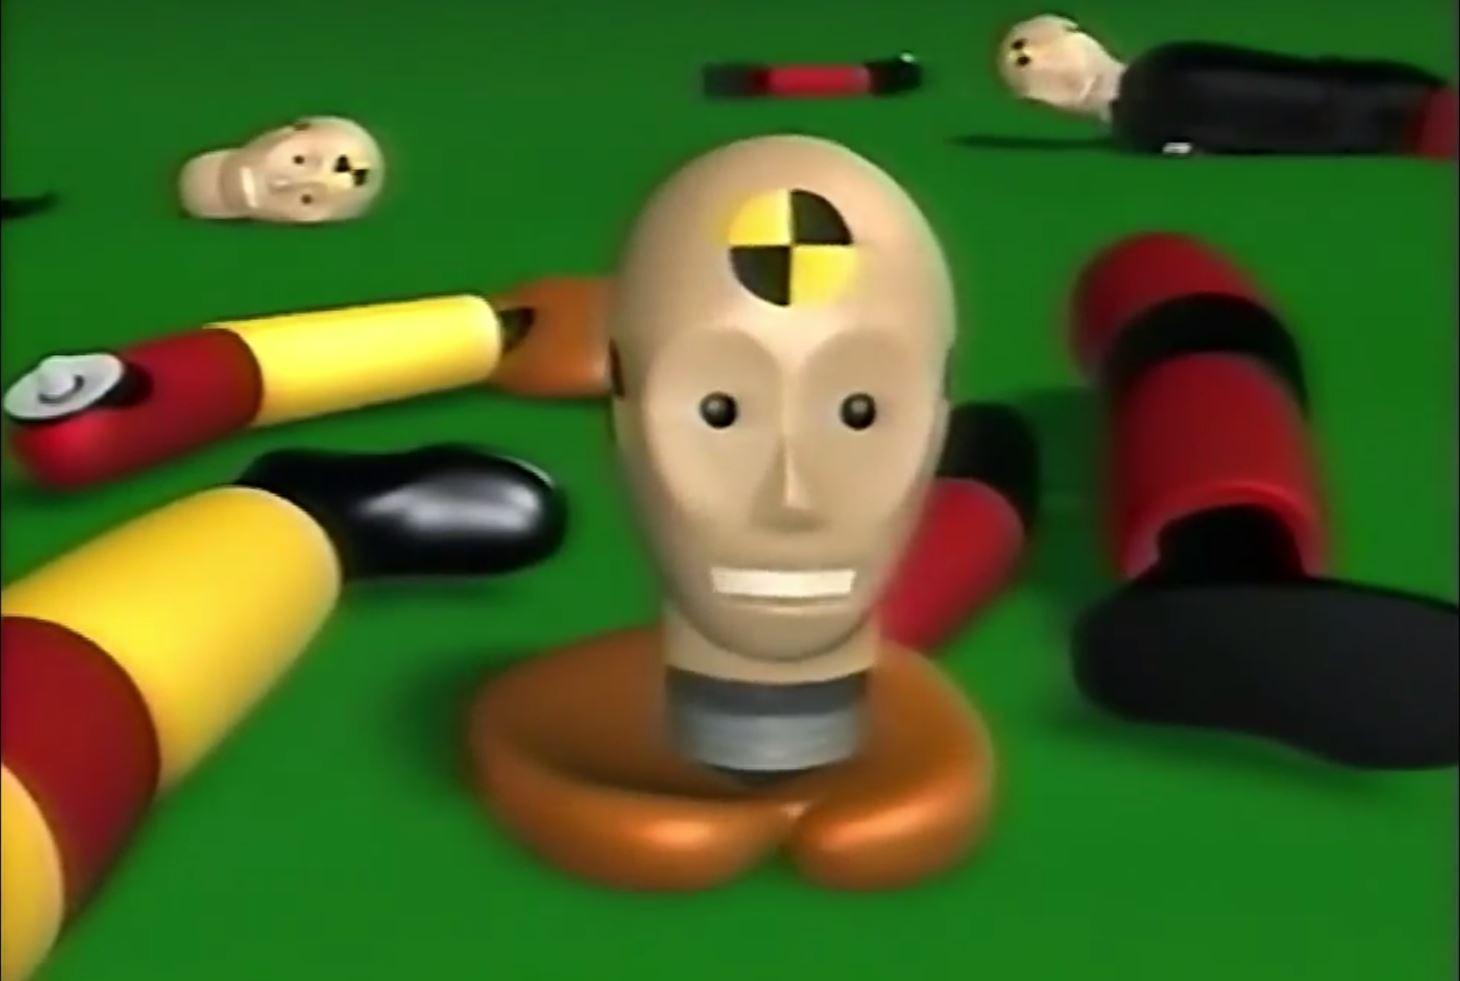 https://thenewswheel.com/wp-content/uploads/2017/08/Incredible-Crash-Dummies-Fox-TV-show-program-1993-CGI-animated-cartoon-cars-2.jpg